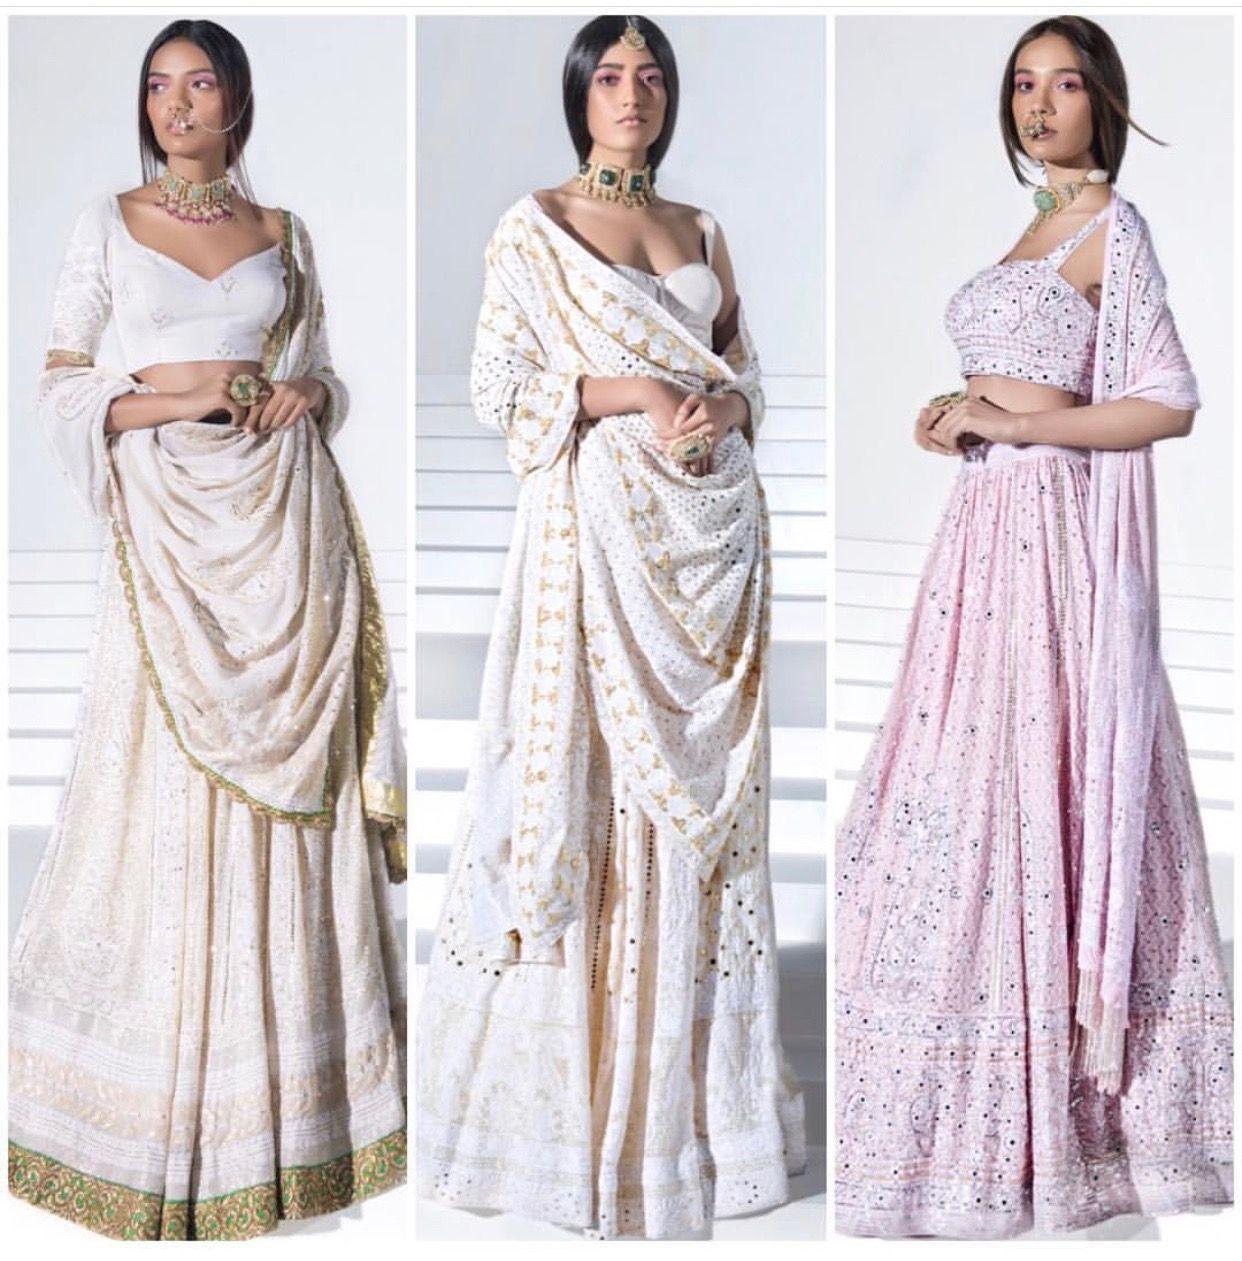 Kanika Kapoor | Indian wedding outfits, Indian dresses ...